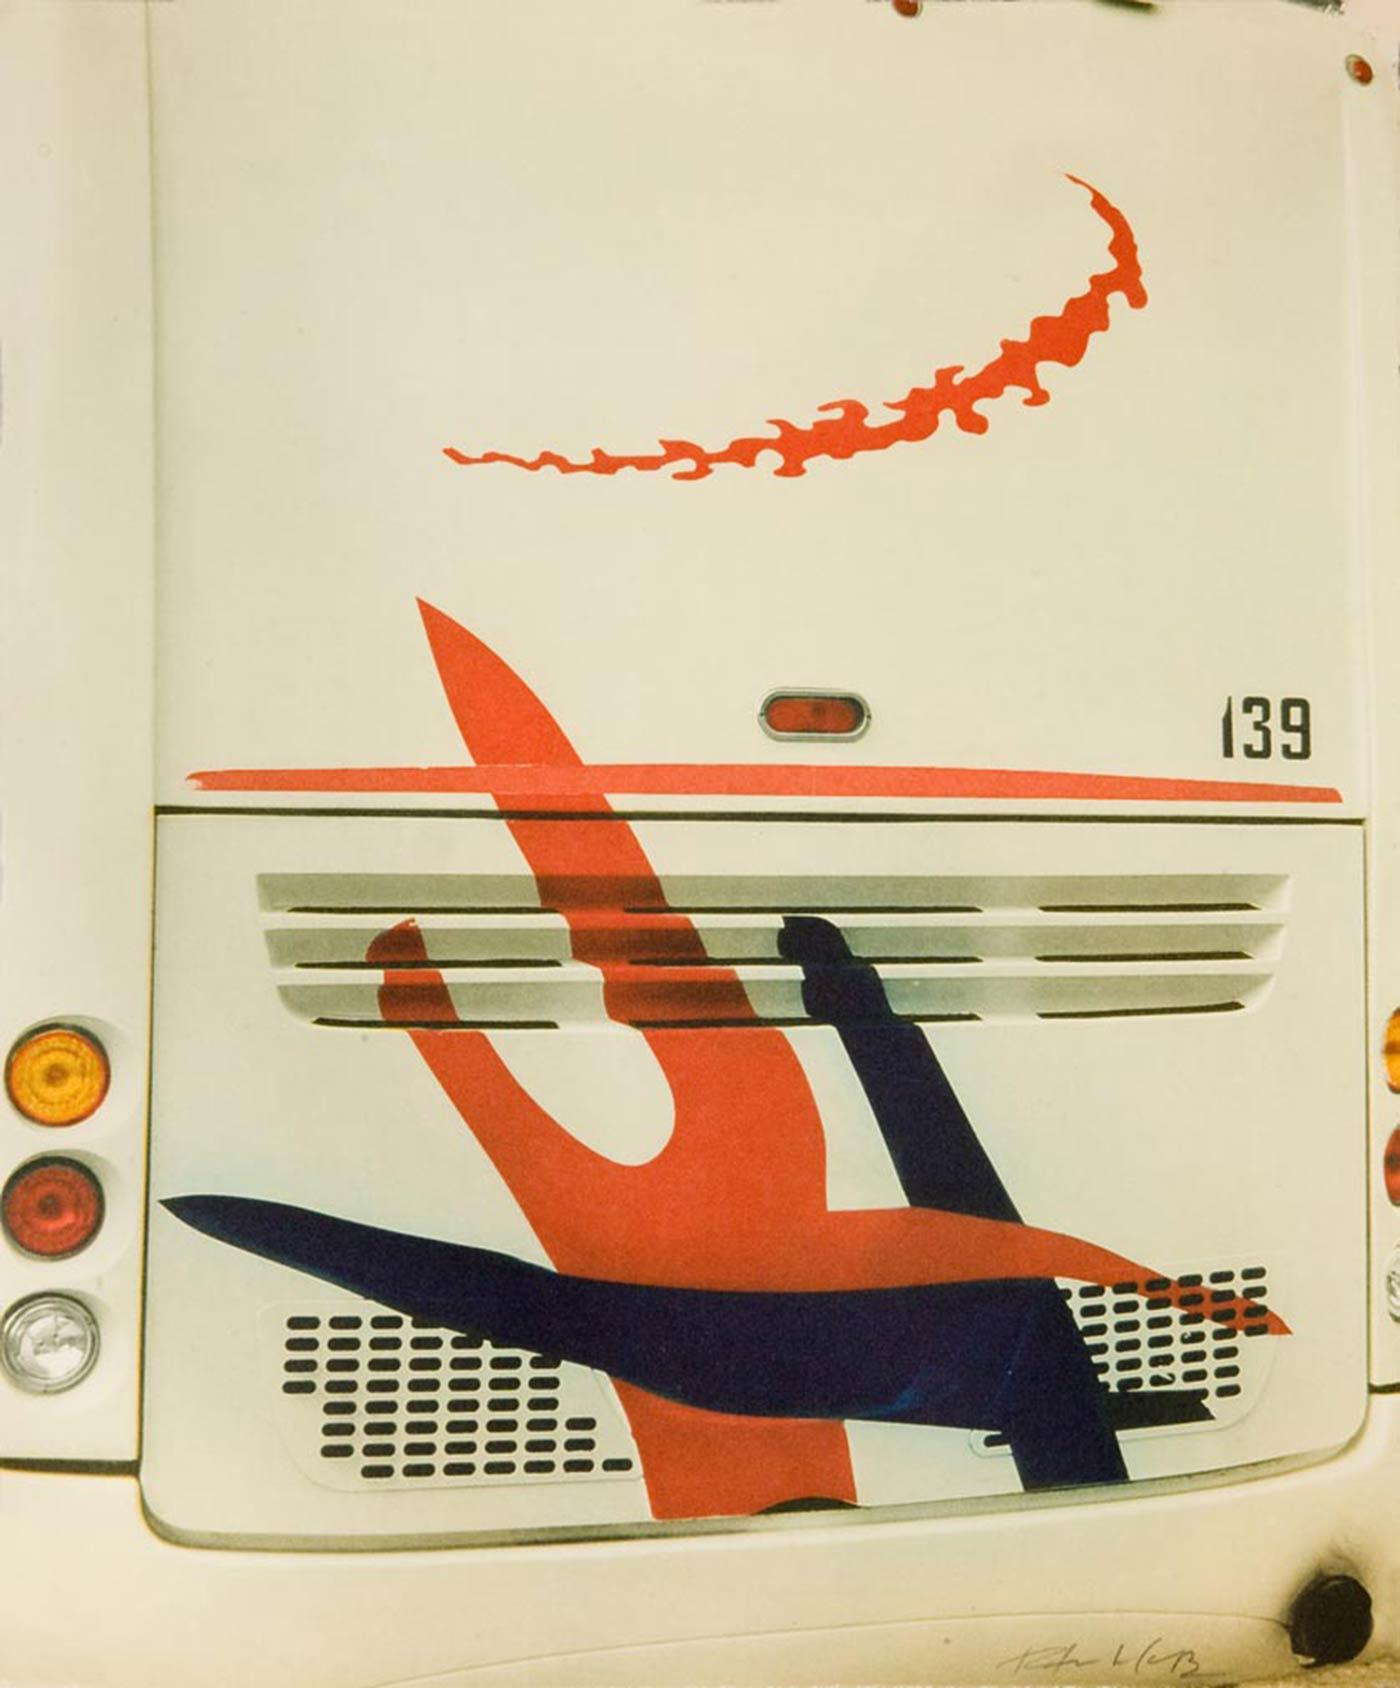 Bus Load (Miro)